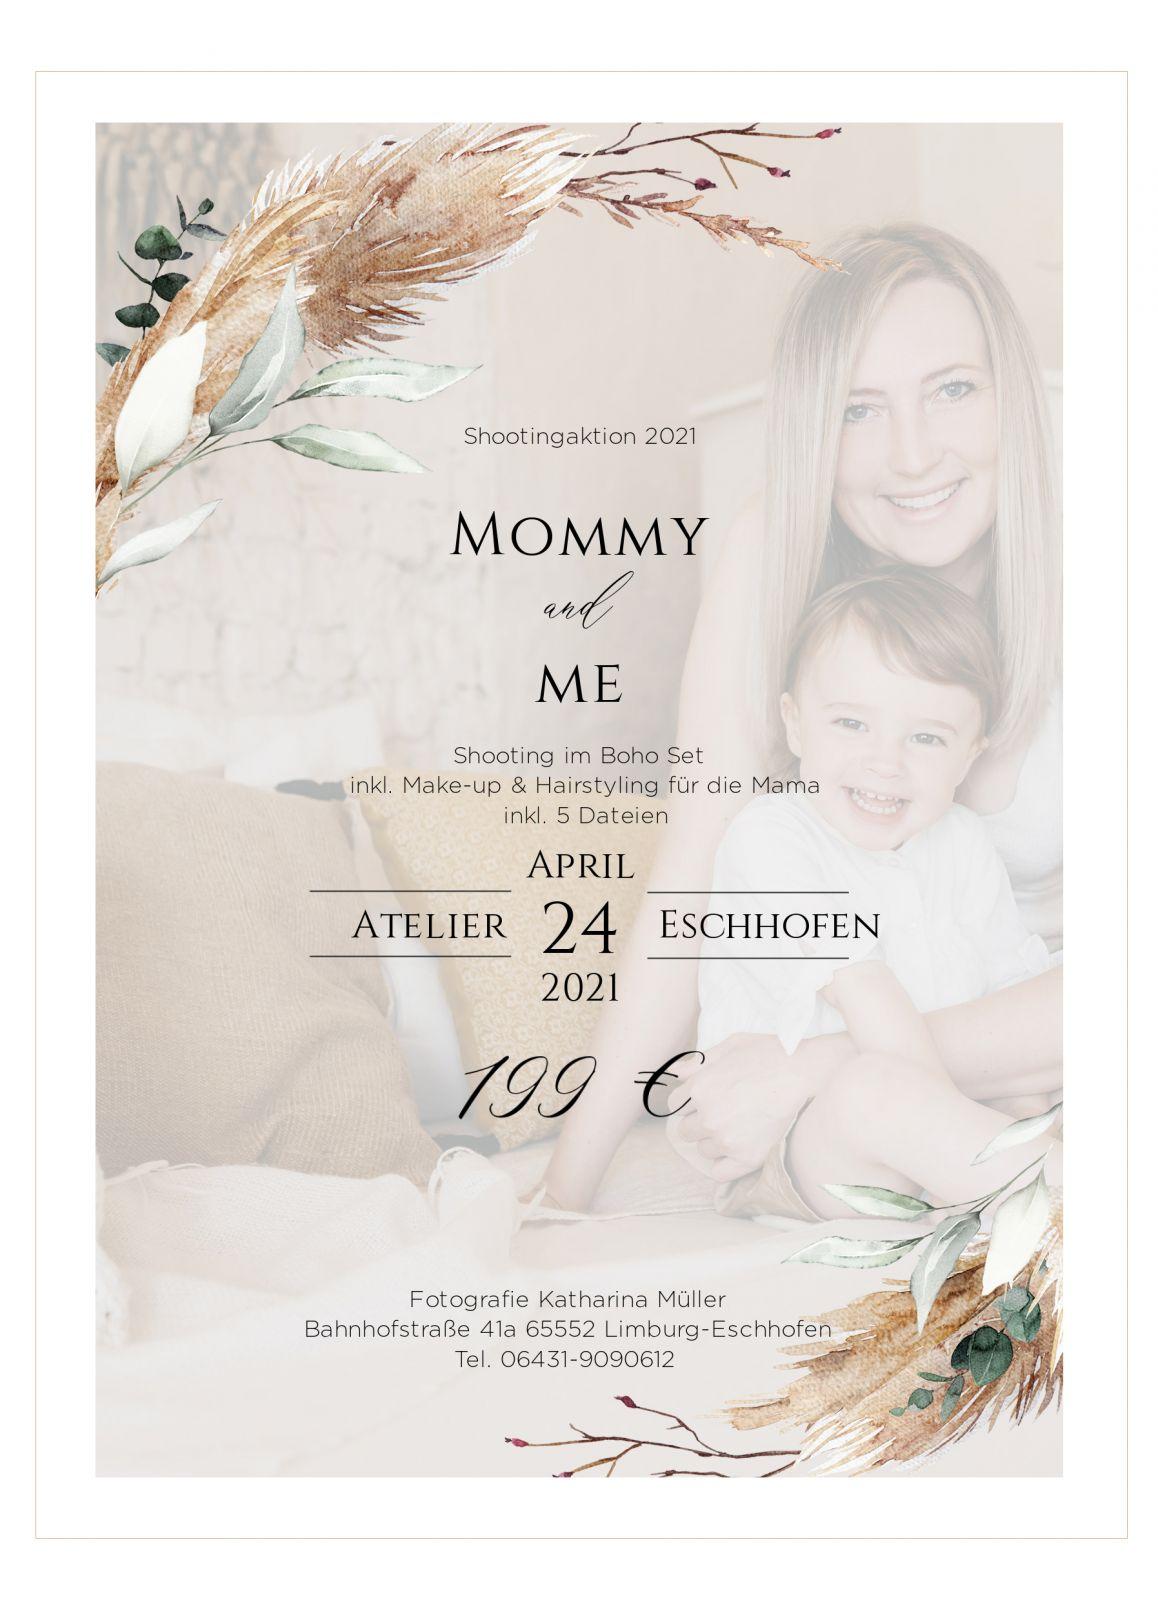 MommyandmemitRand 3